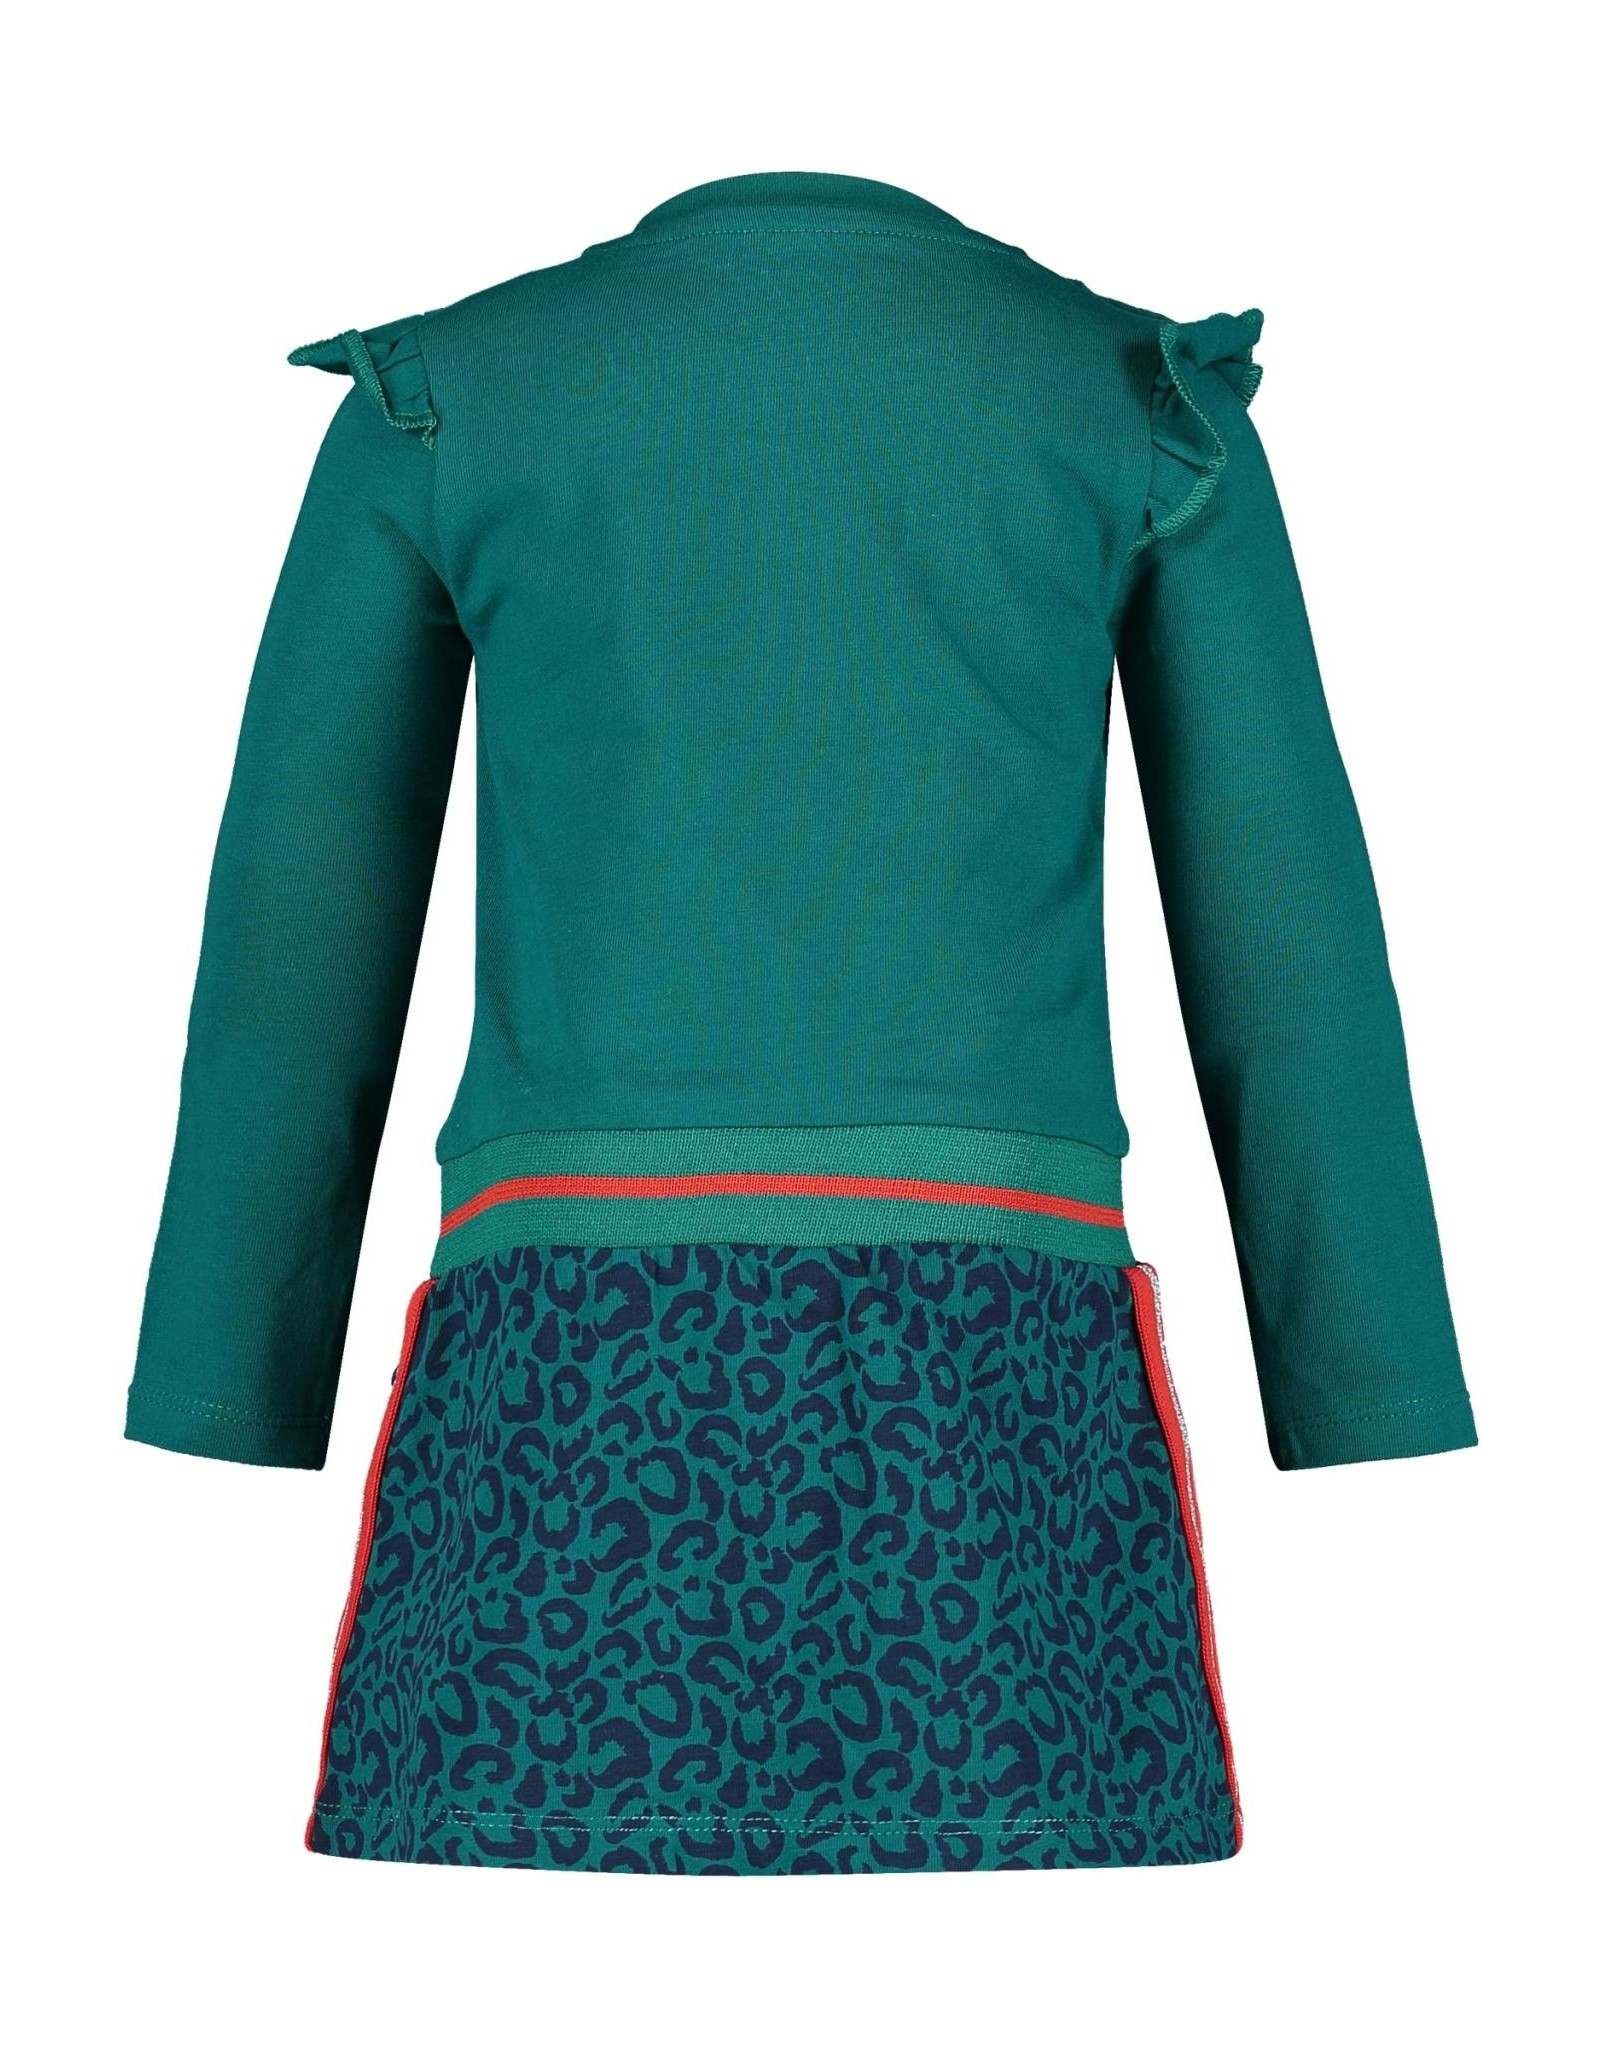 4President 4President meisjes jurk Maria Dark Petrol